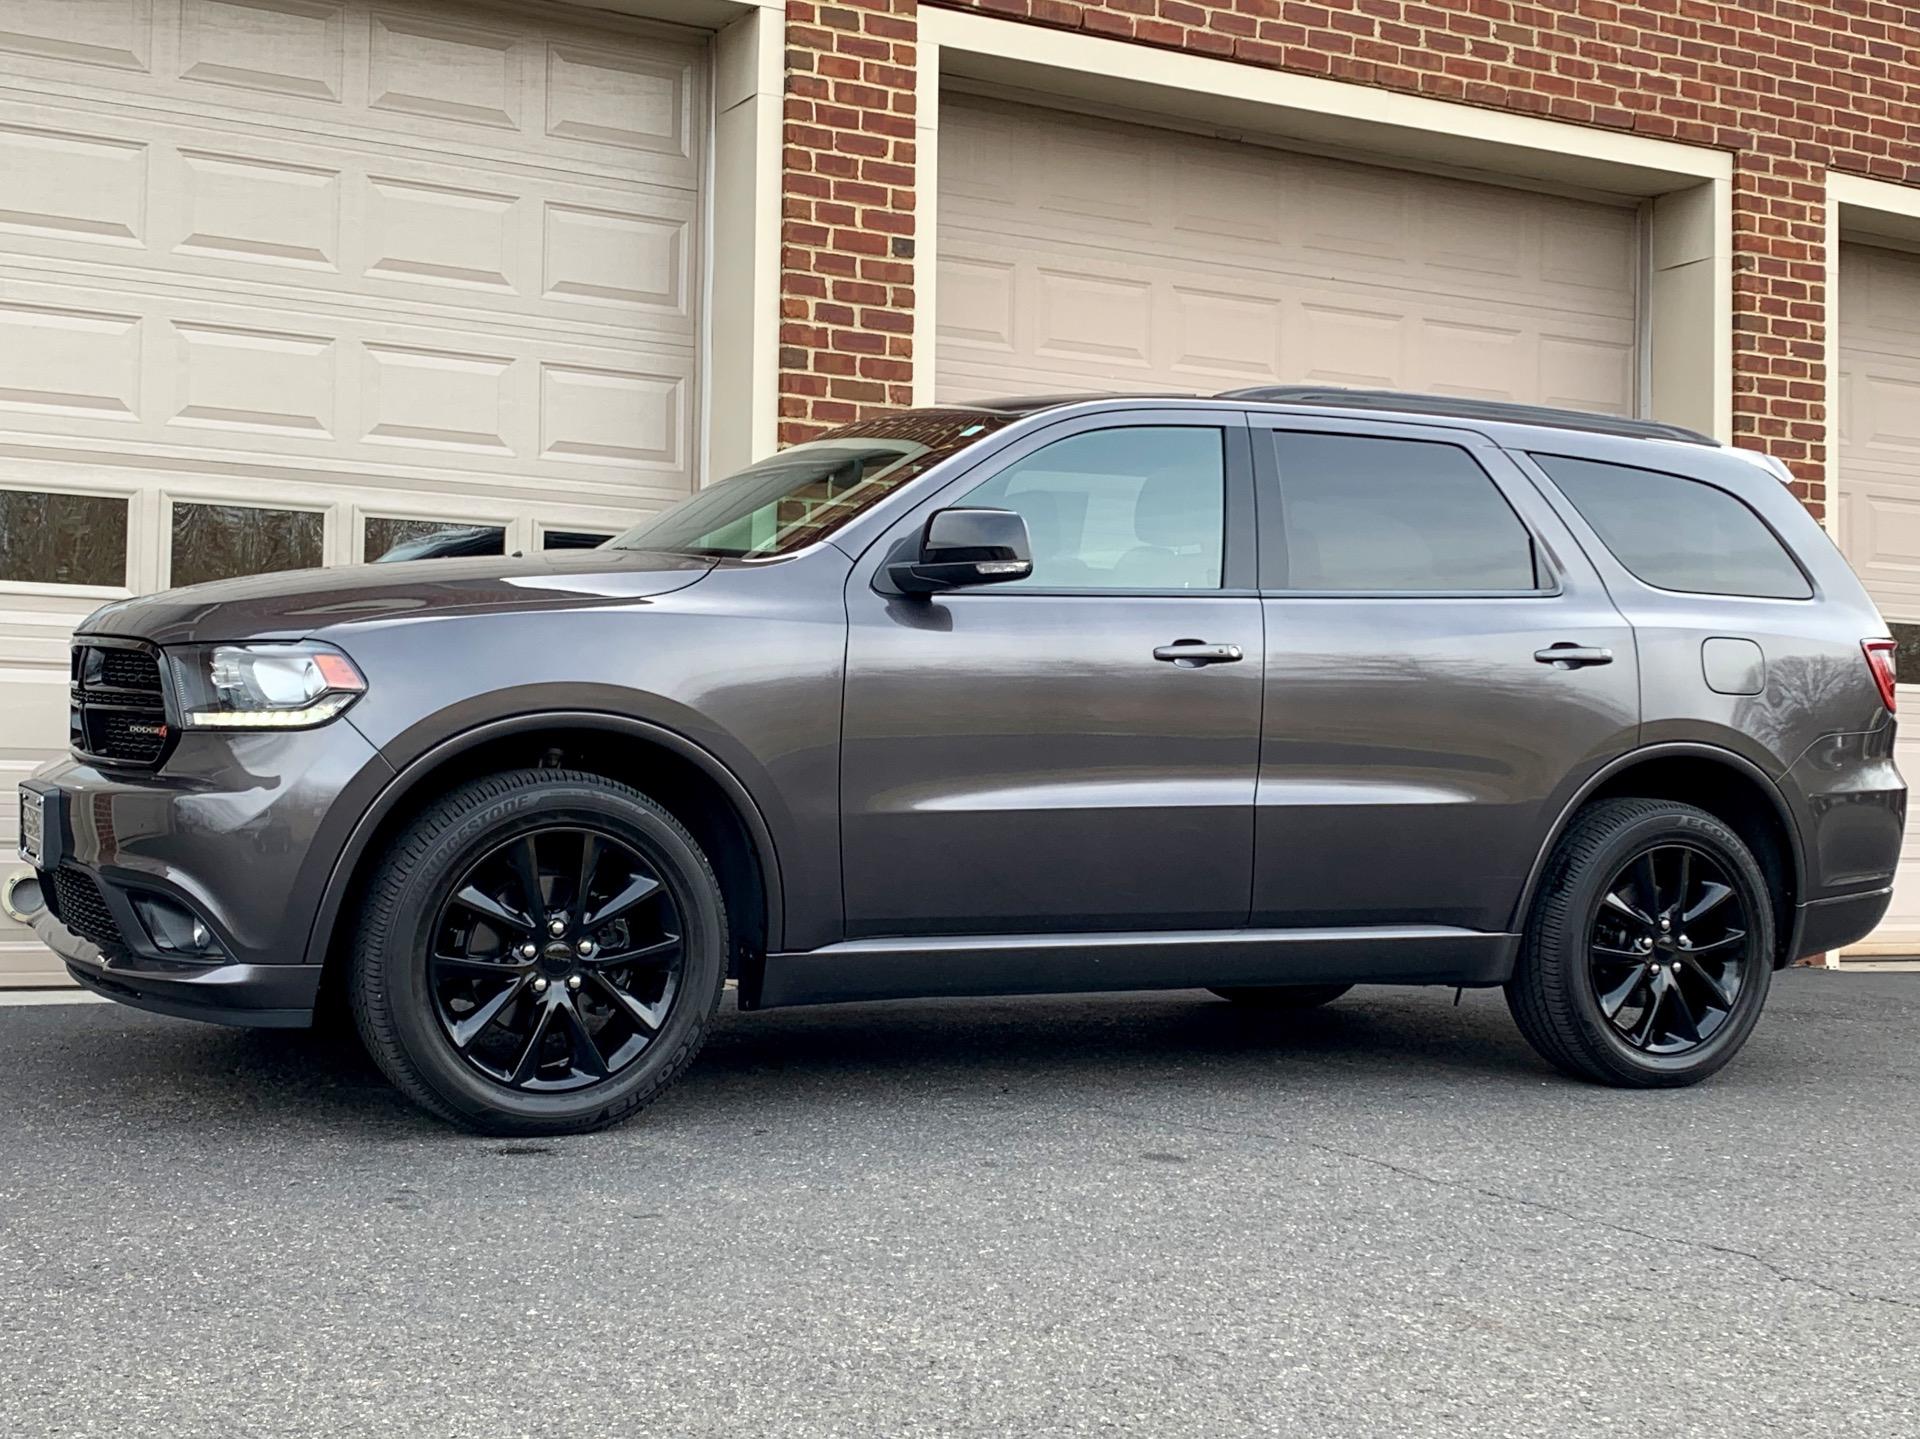 Used-2018-Dodge-Durango-GT-Black-Top